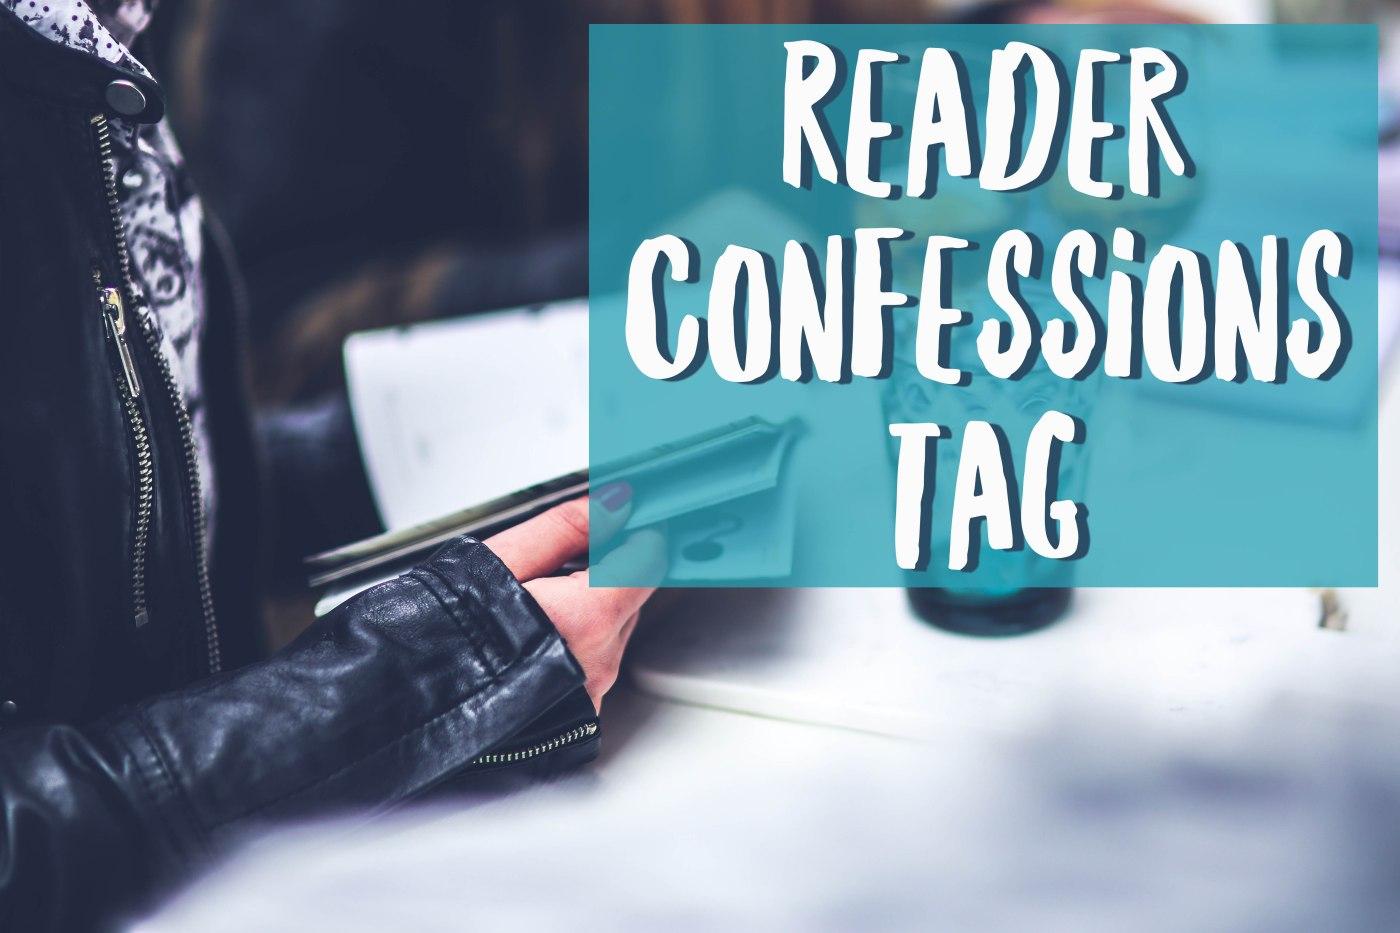 Reader Confessions Tag